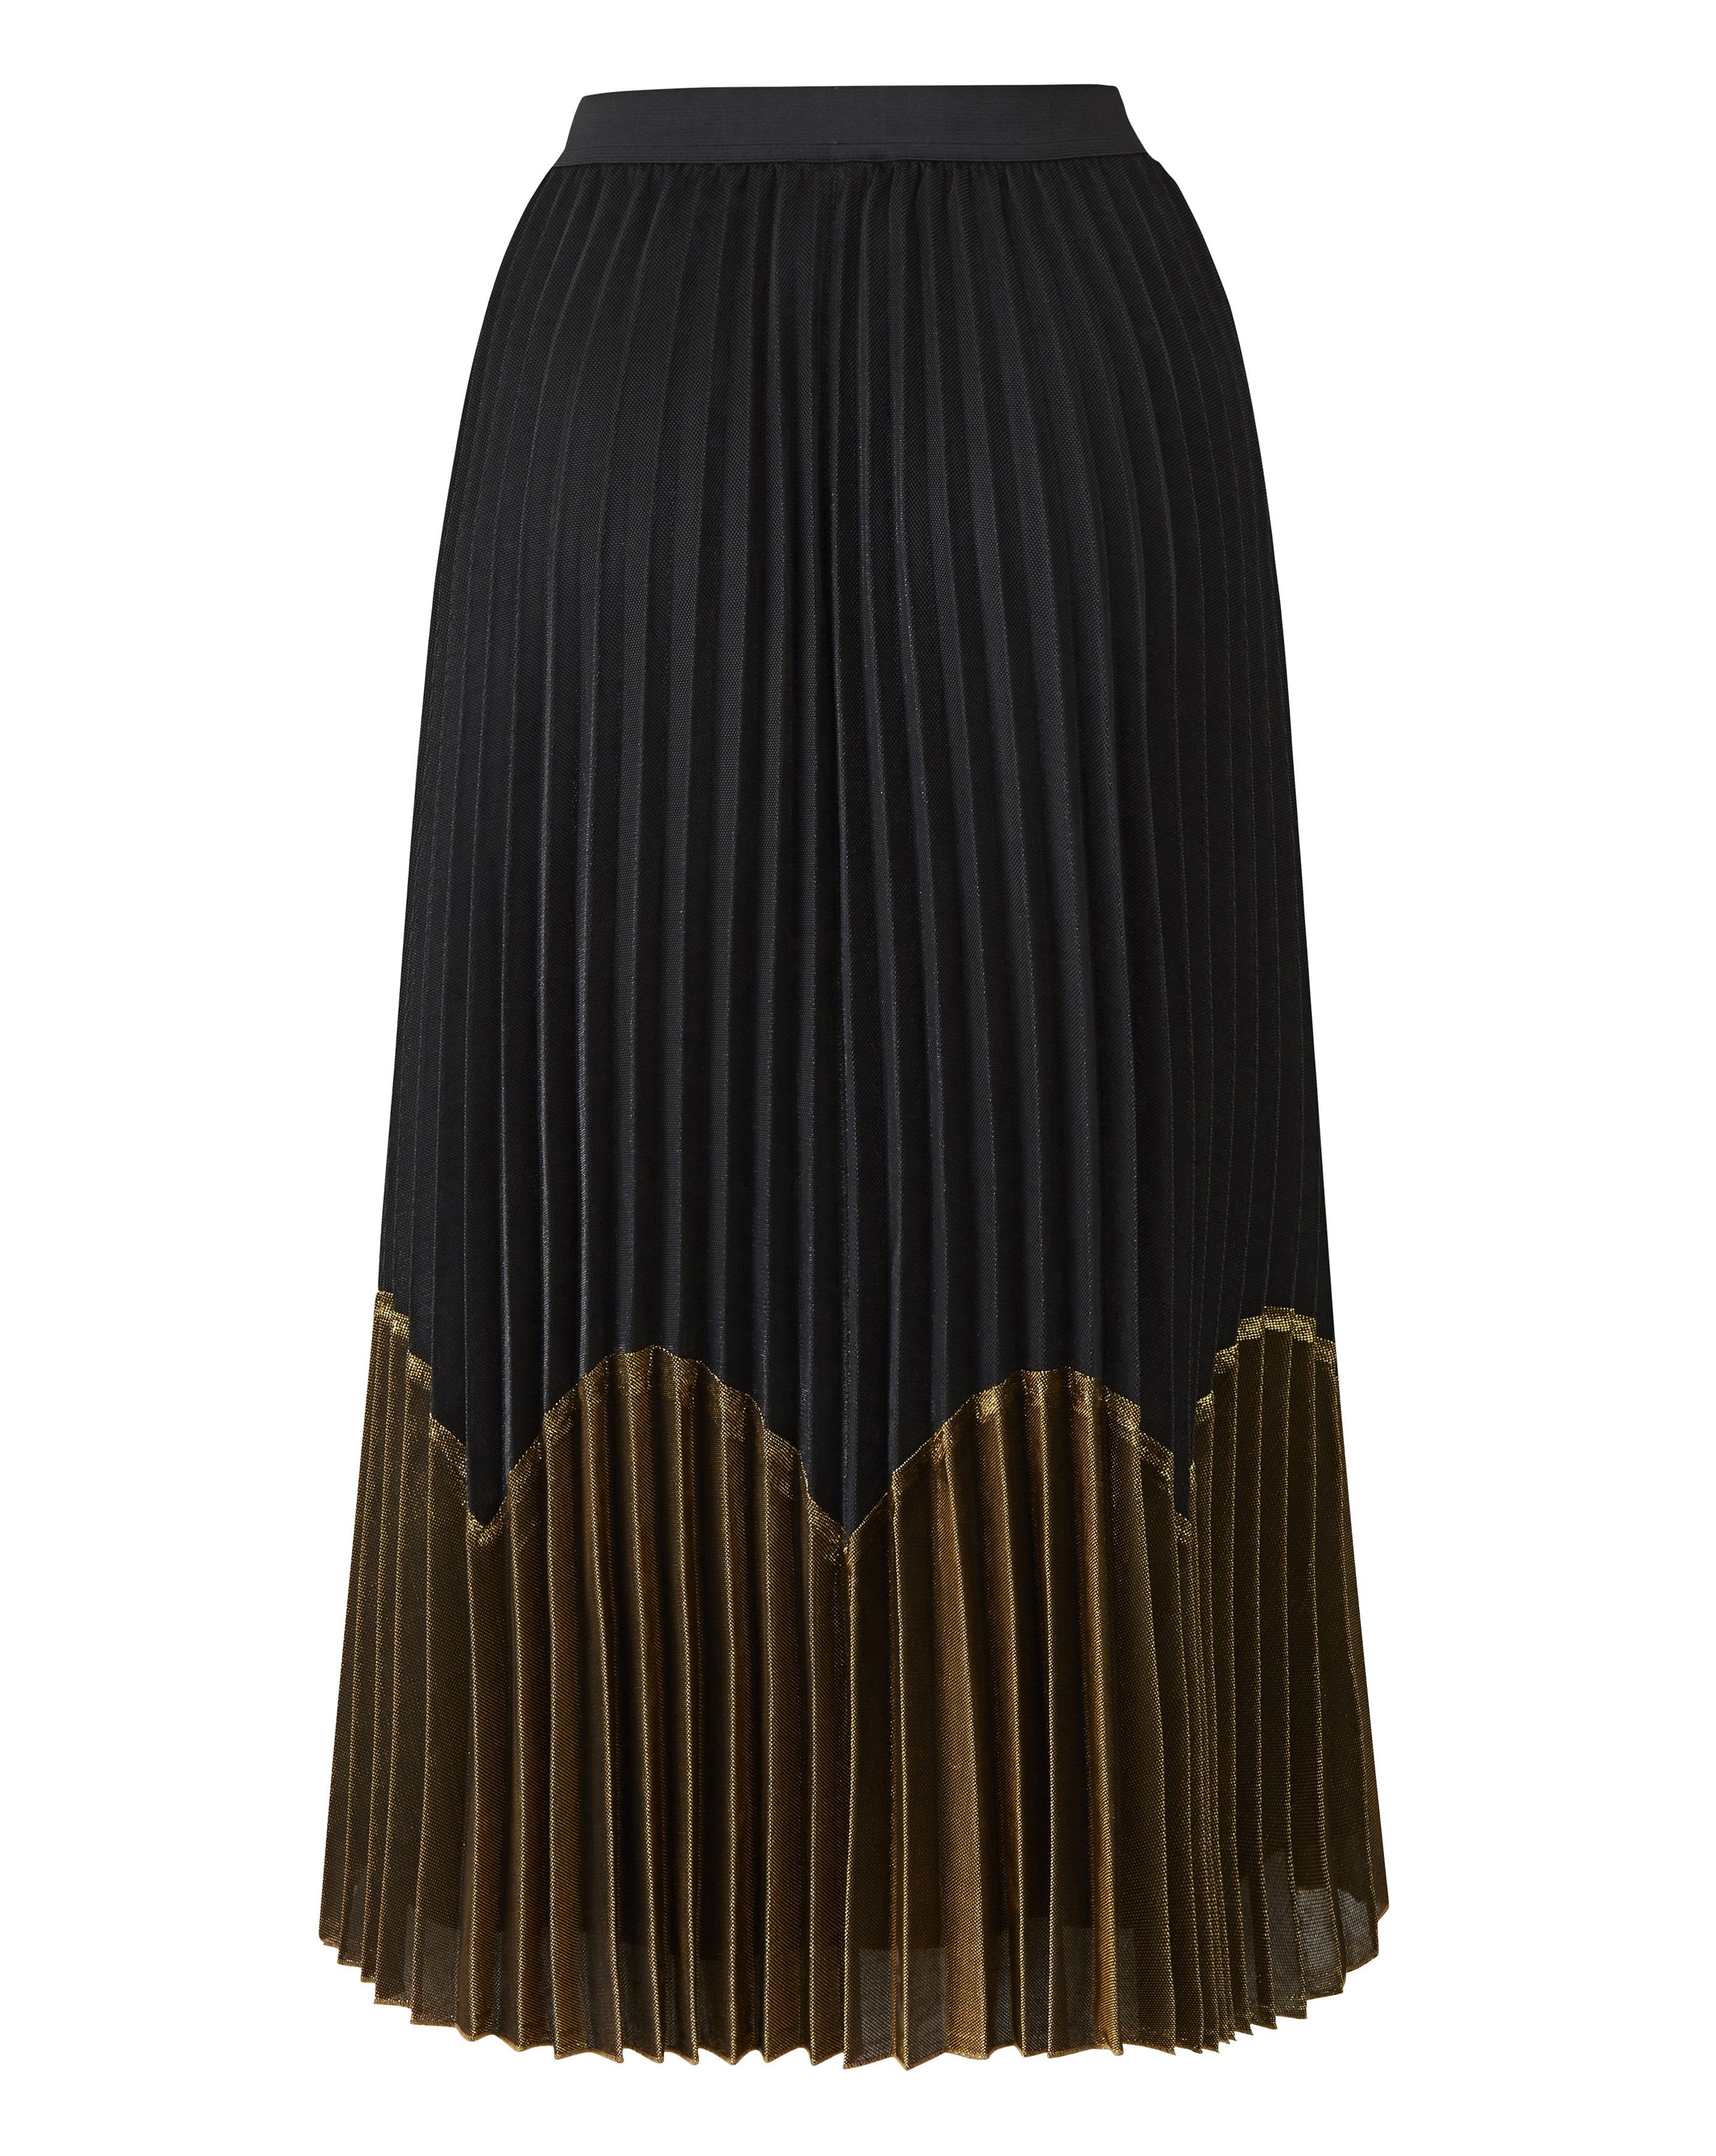 313b797b8569 Ladies Sunray Pleated Skirts – DACC